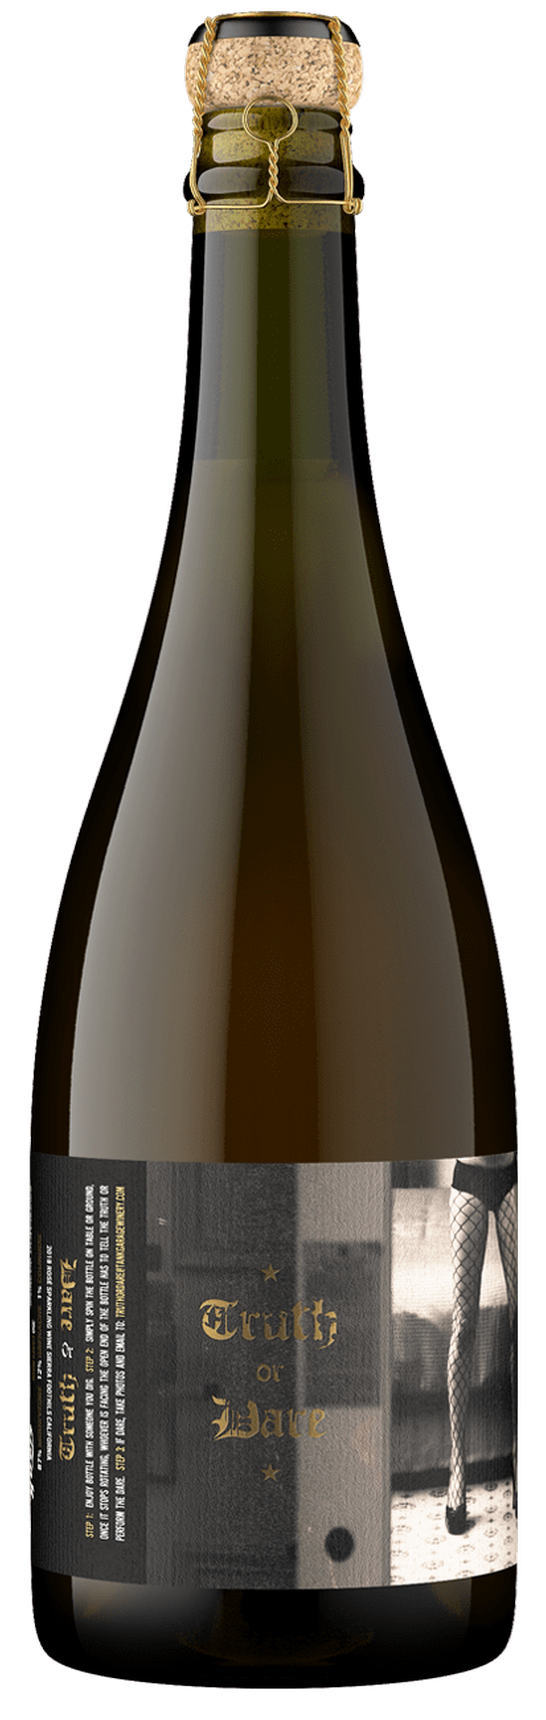 2018 Truth or Dare, Rosé Sparkling Wine, Sierra Foothills